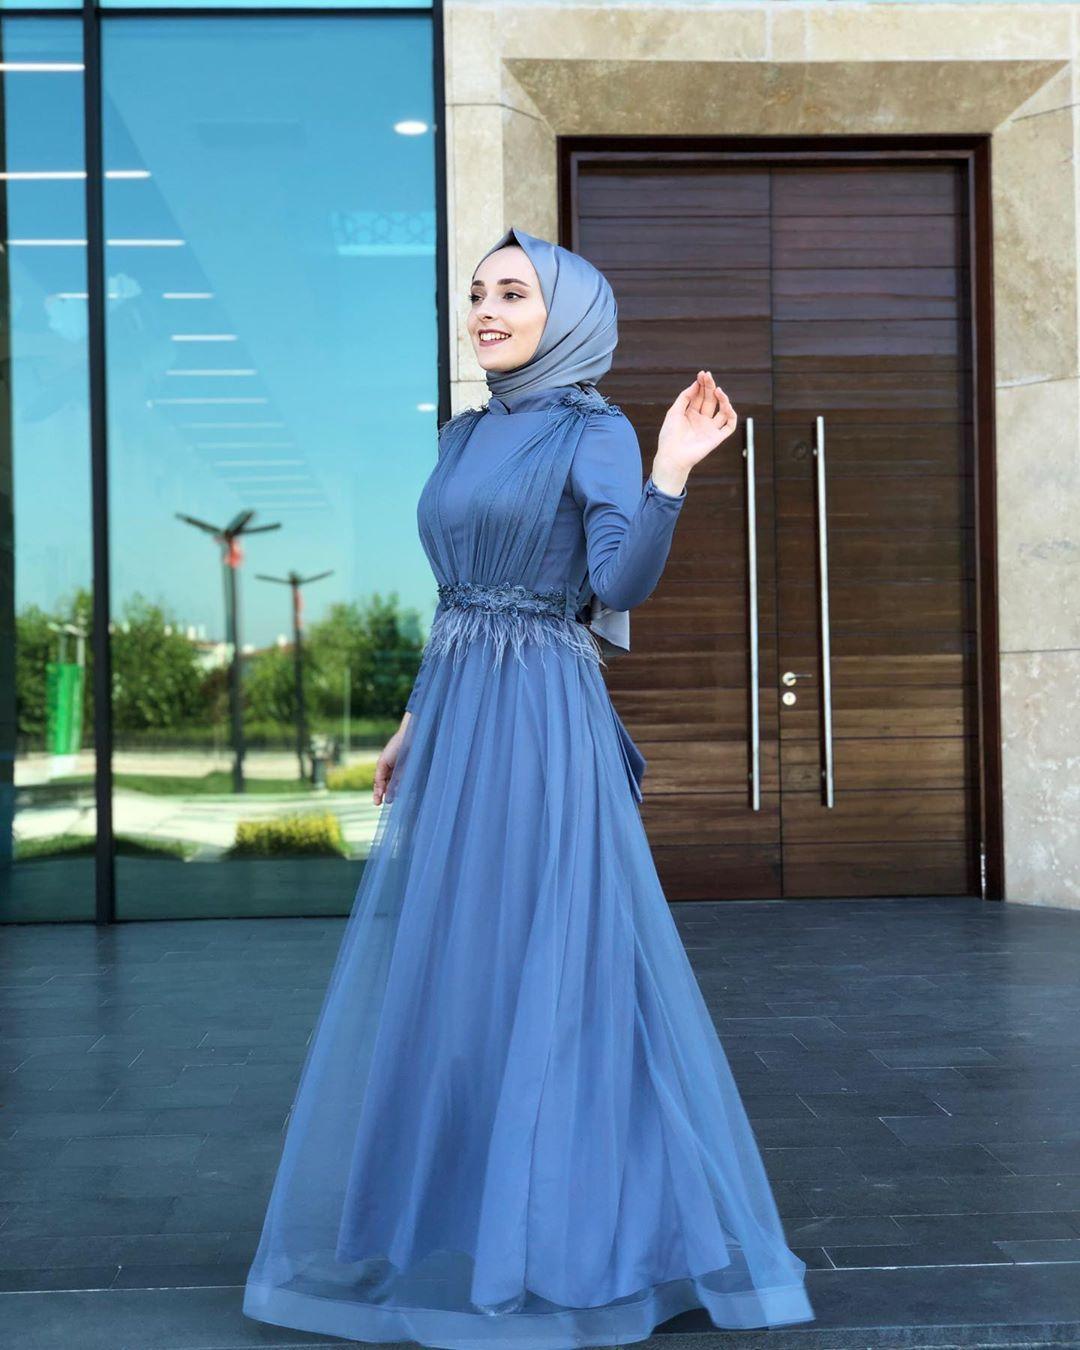 Nilem Store On Instagram Elbisemizin Mavi Rengi Beden 36 38 40 42 Araligi Payet Elbise Elbise Organze Gelinlik